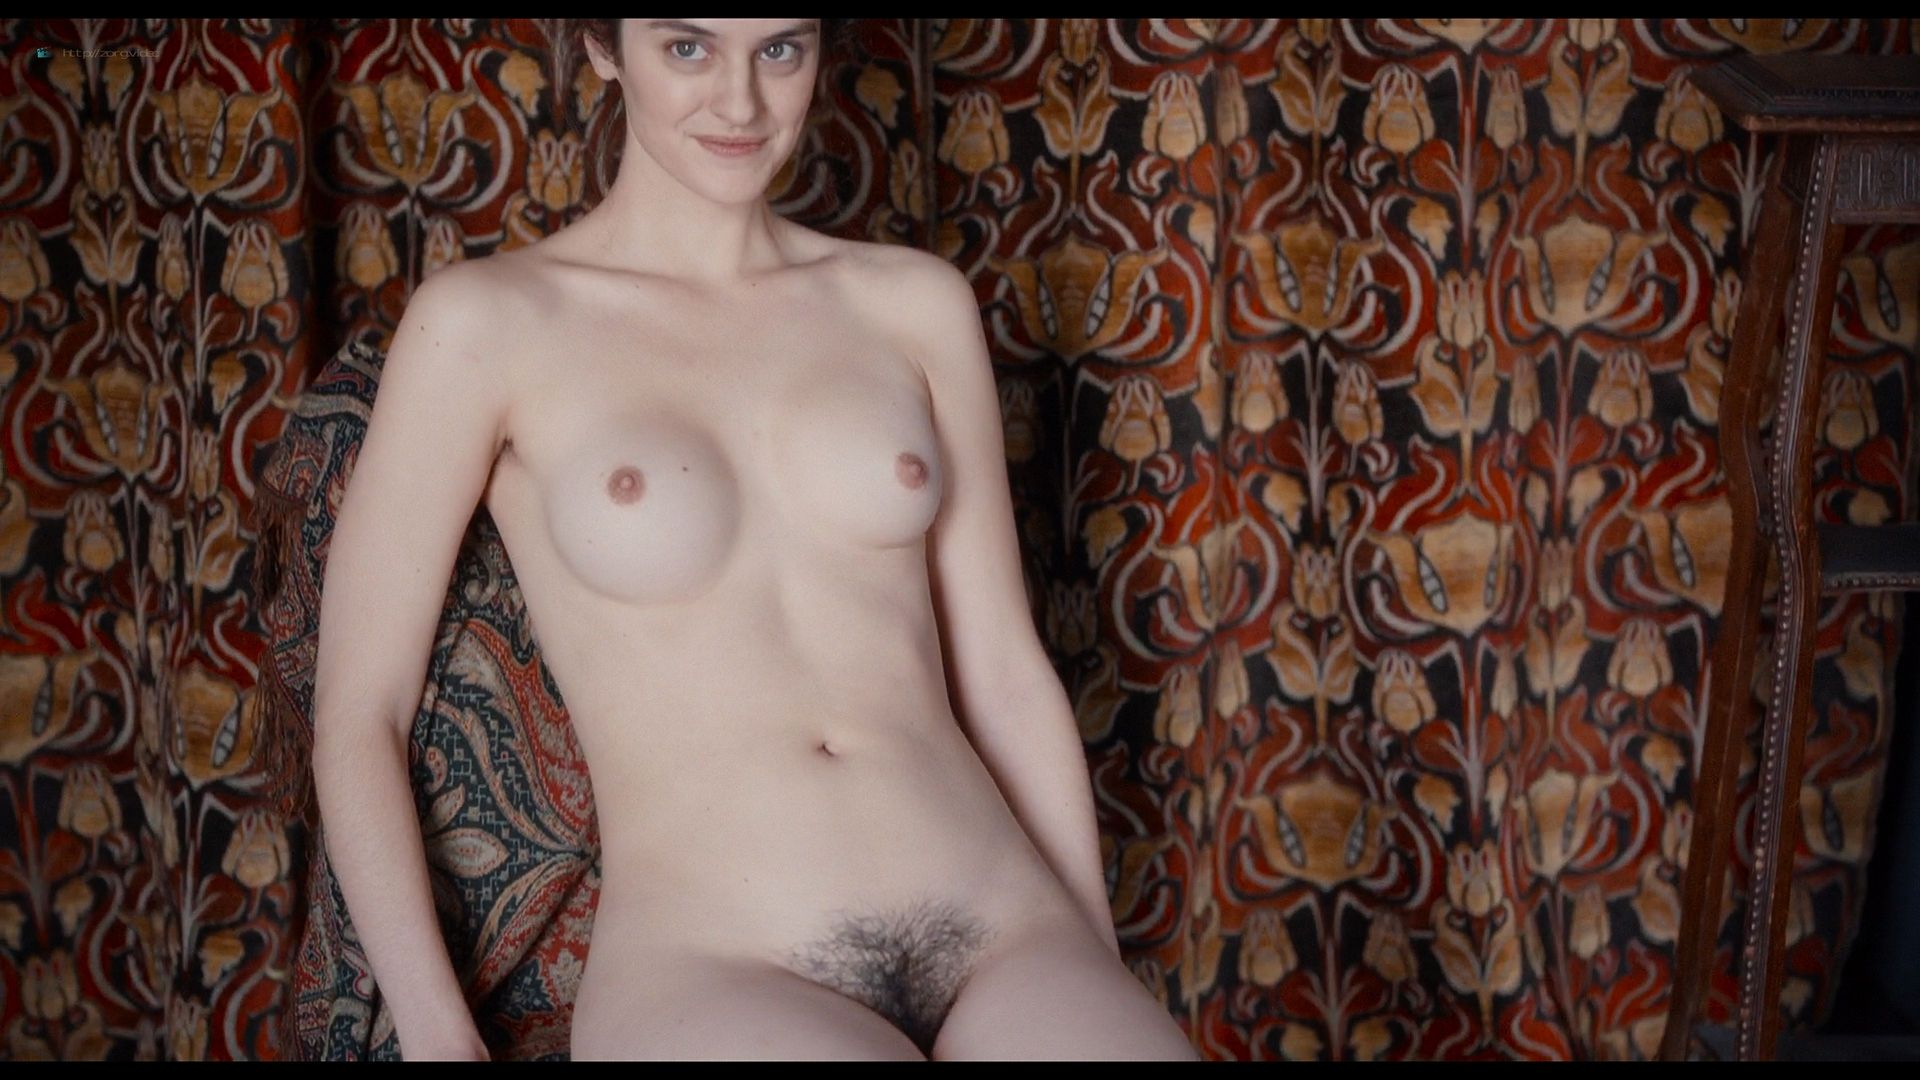 0608000137710_15_Noemie-Merlant-nude-full-frontal-Camelia-Jordana-Amira-Casar-and-others-nude-Curiosa-2019-HD-1080p-Web-.jpg